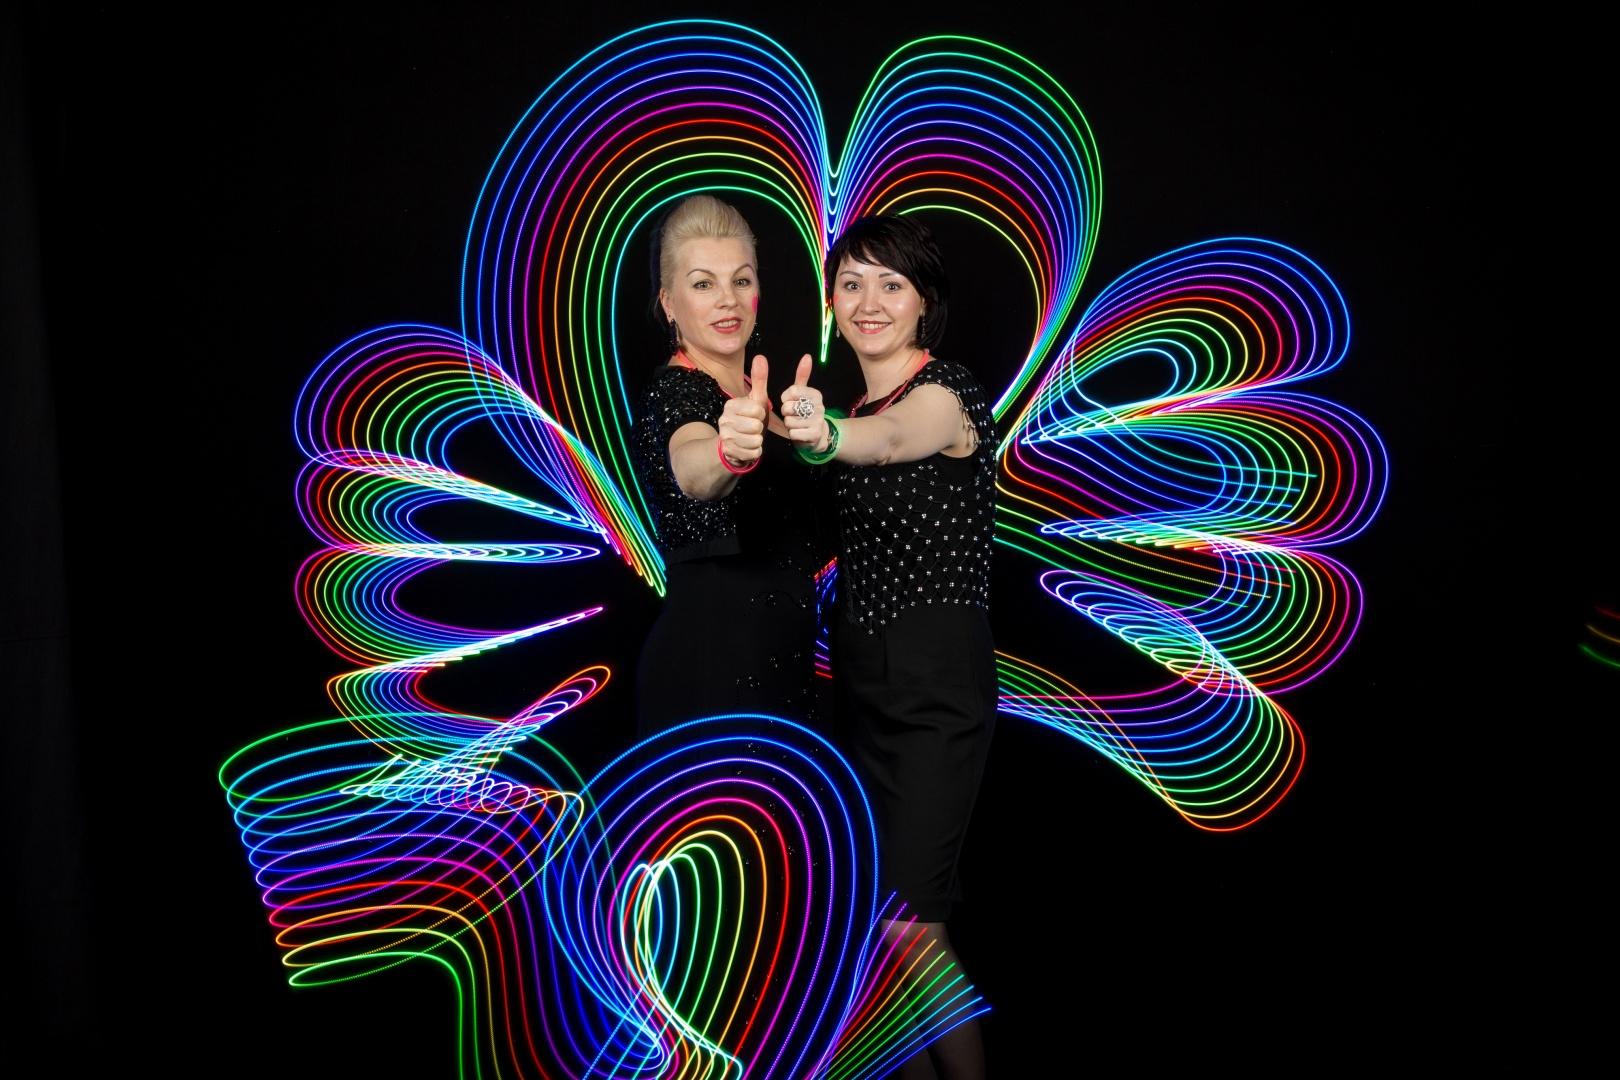 LED Painting - výlet do fantazie | Event Interactive